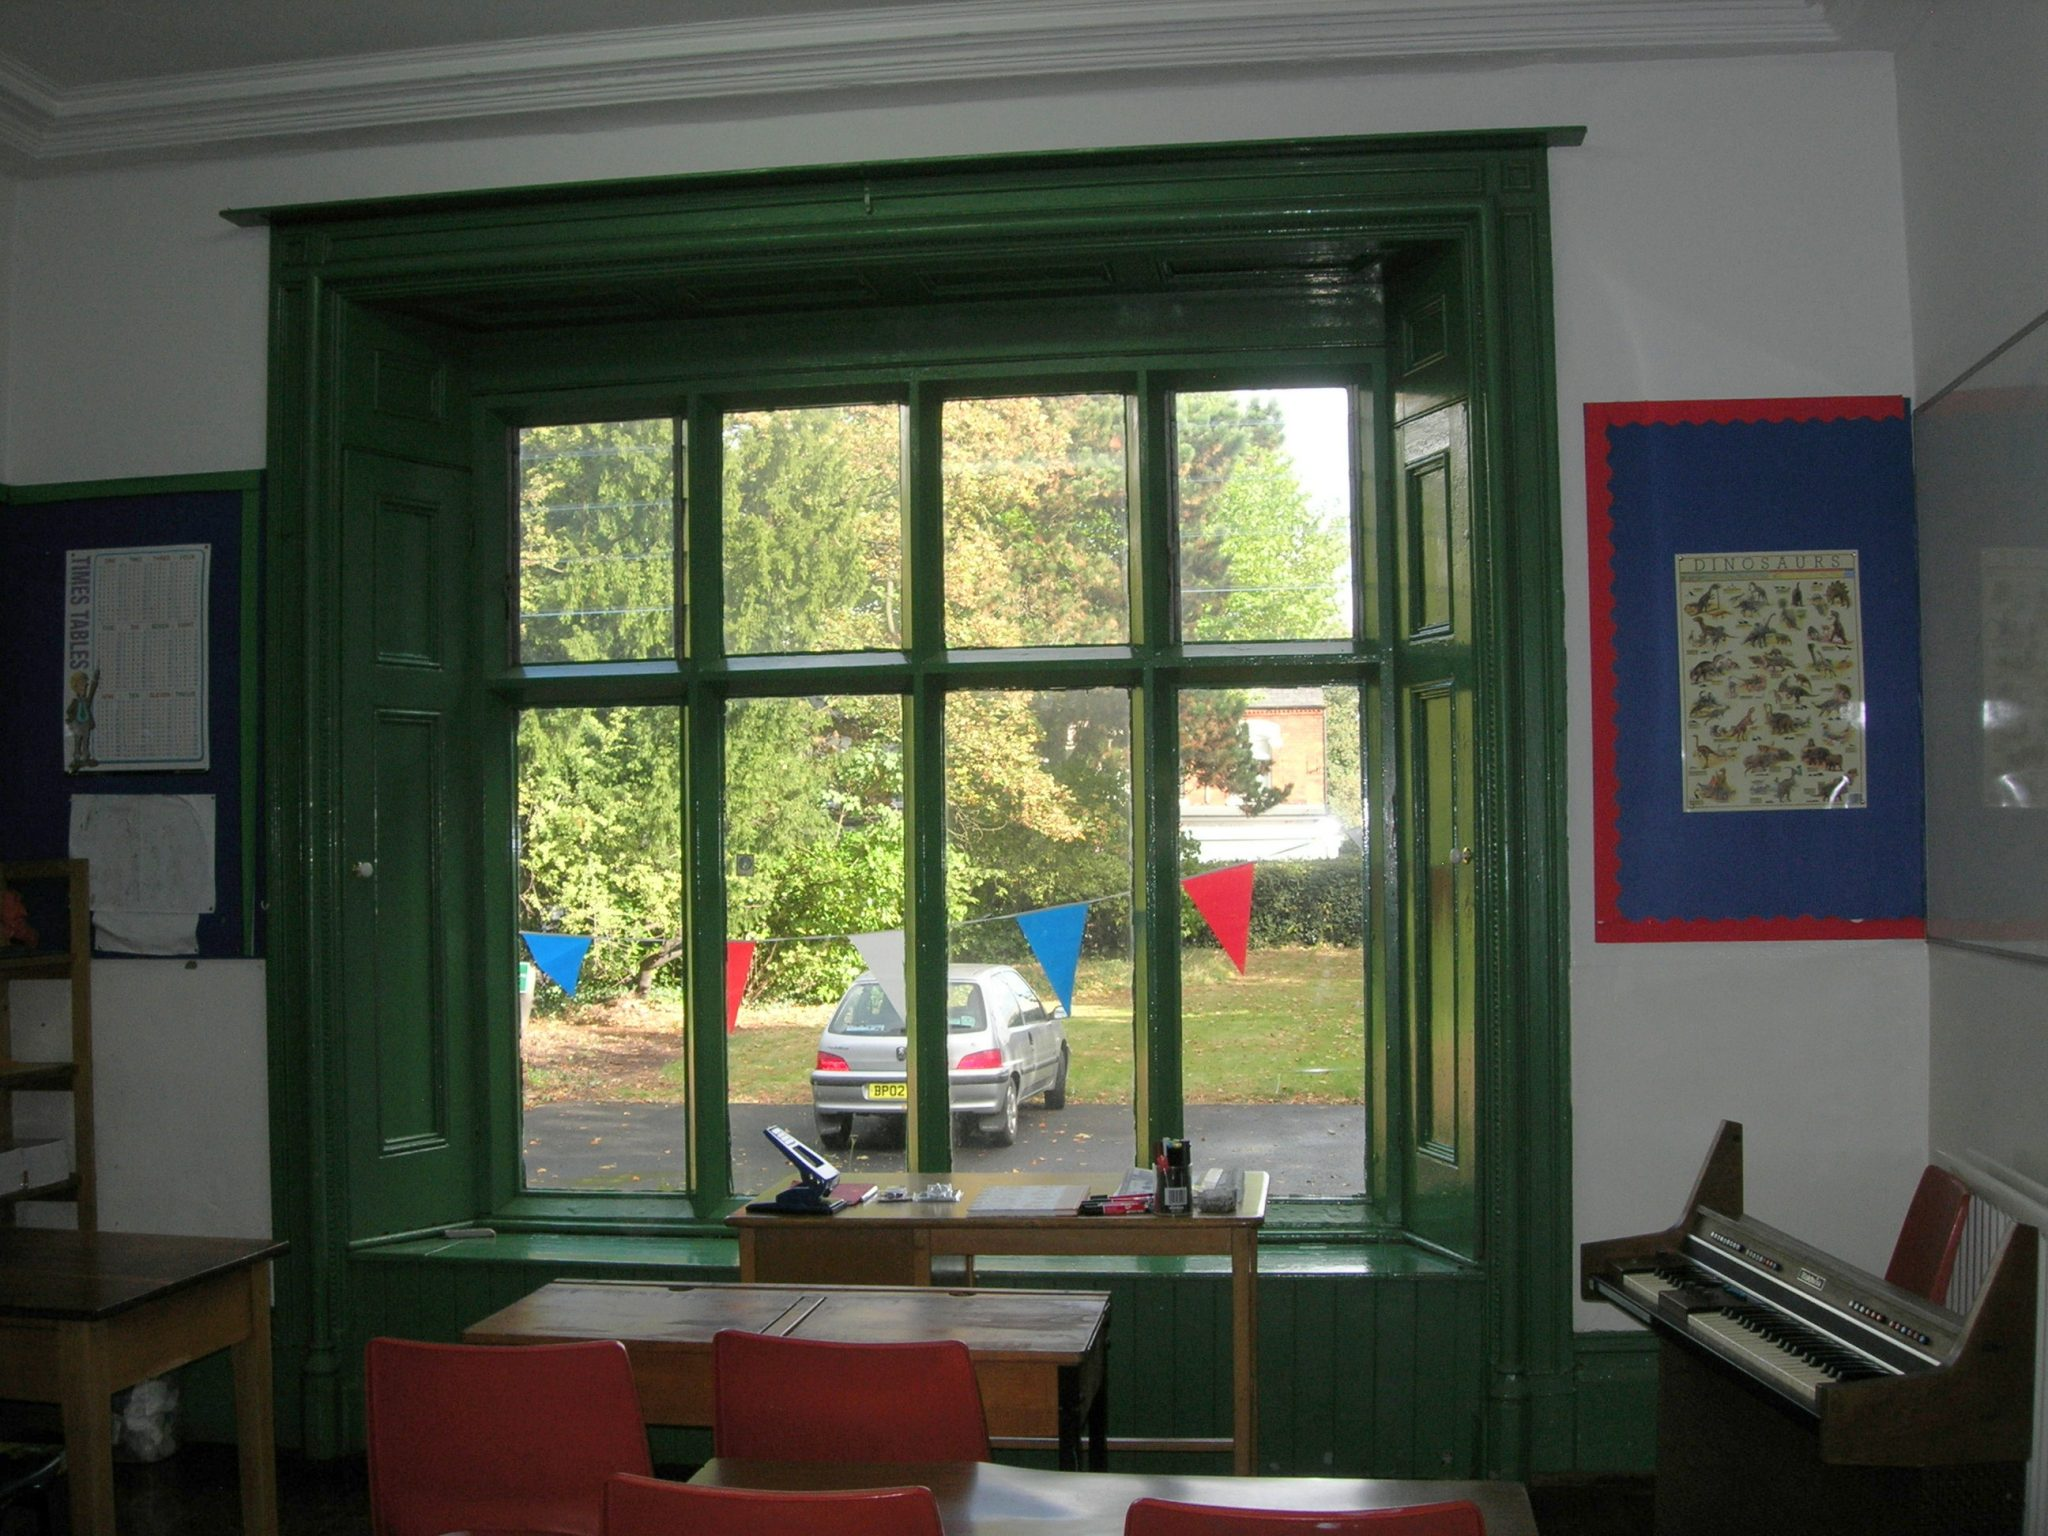 Vardagsrum med grönt fönster.  Källa: acocksgreenfocusgroup.org.uk